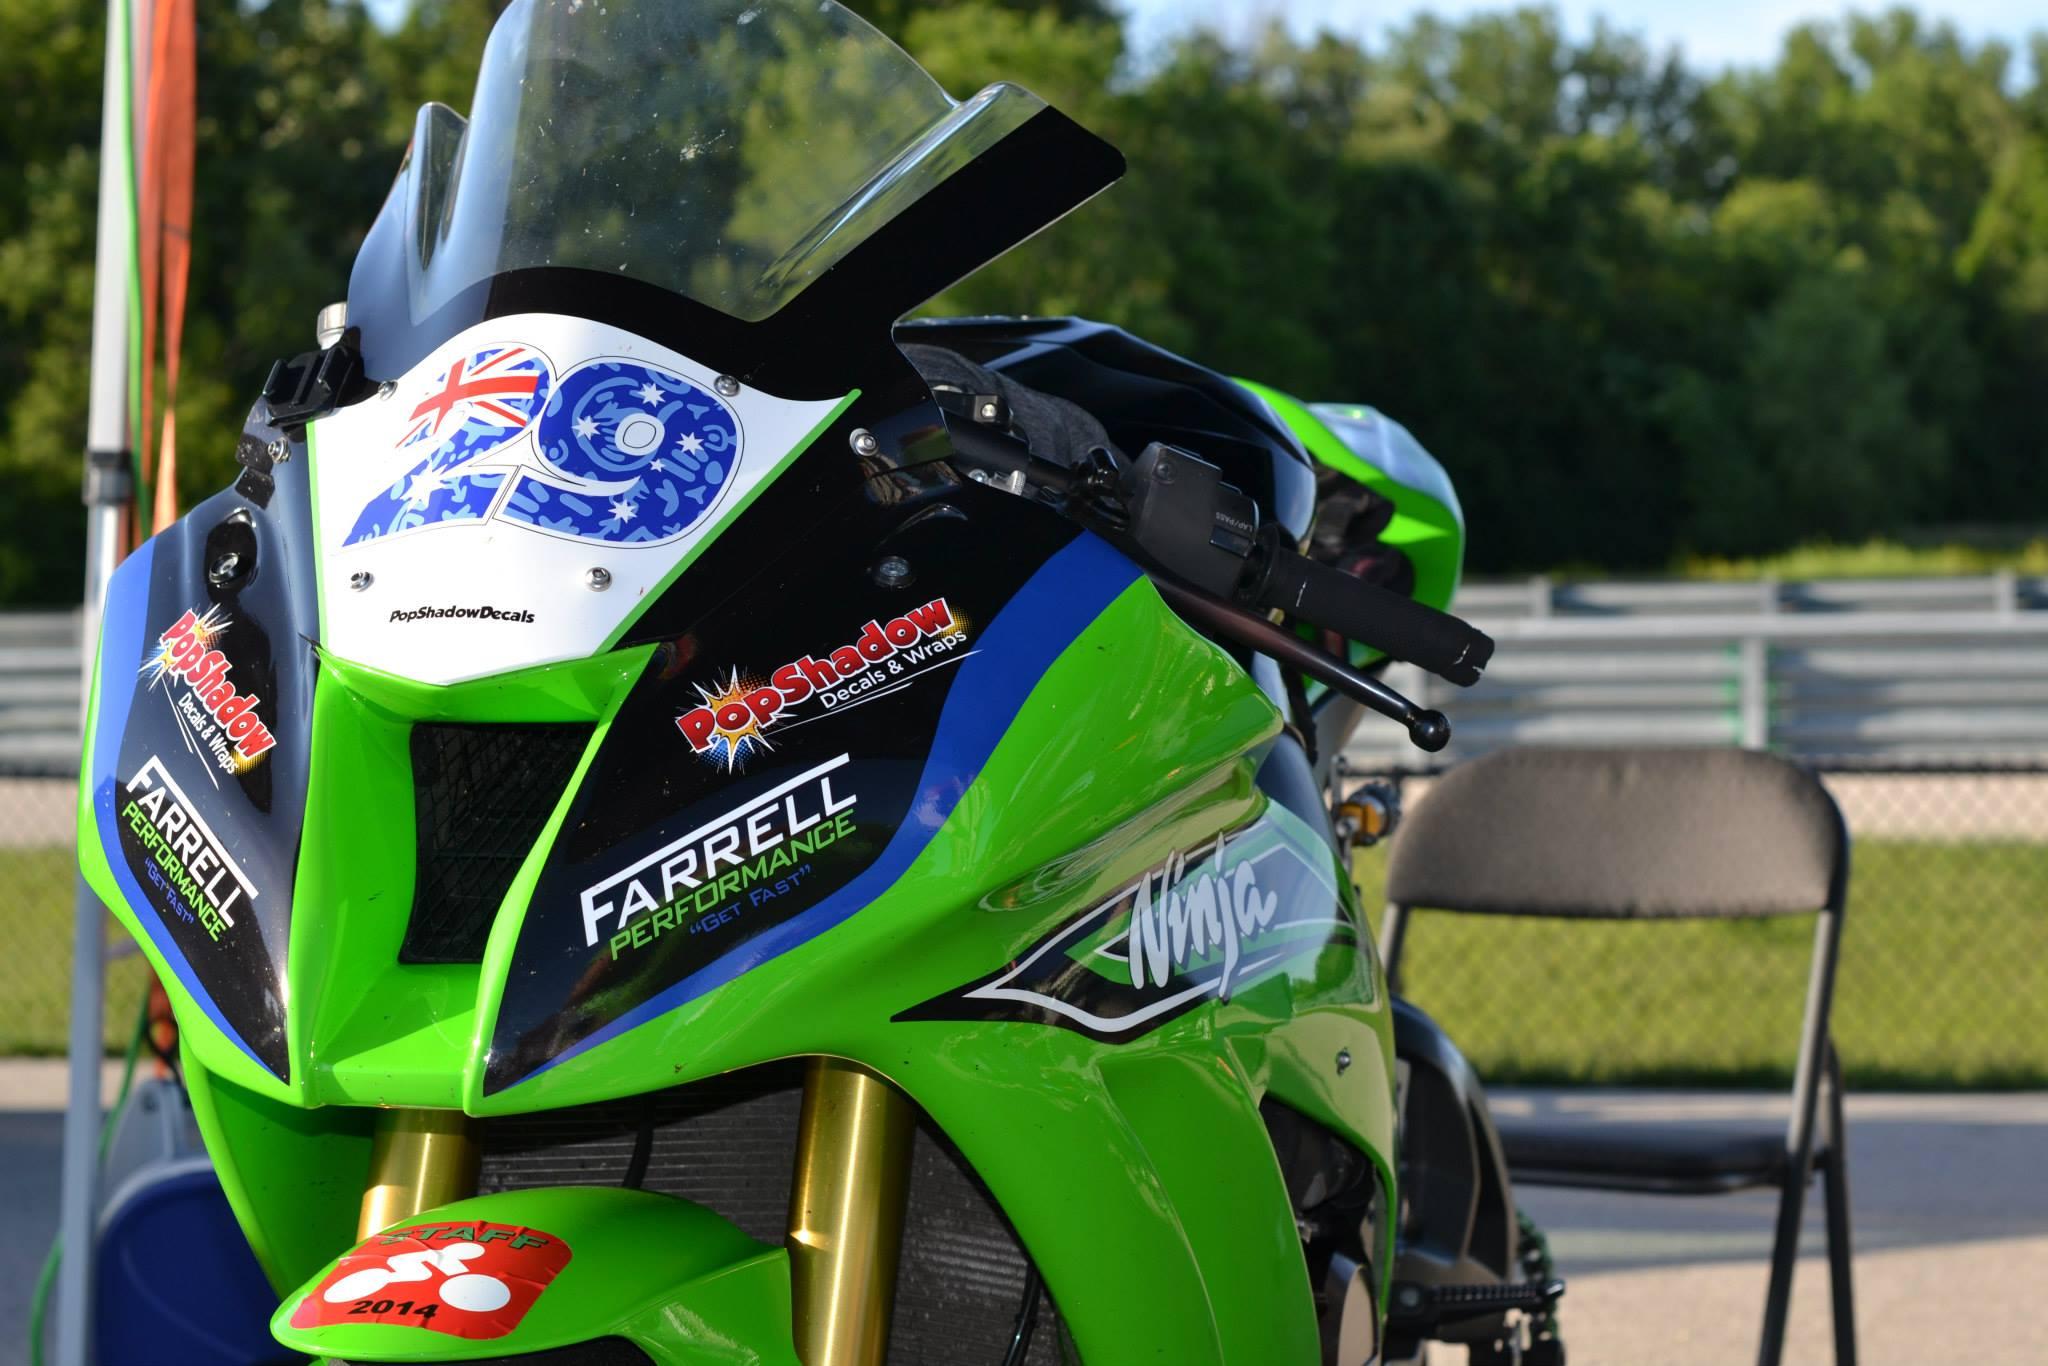 PopShadow Decals - Custom motorcycle stickers racing